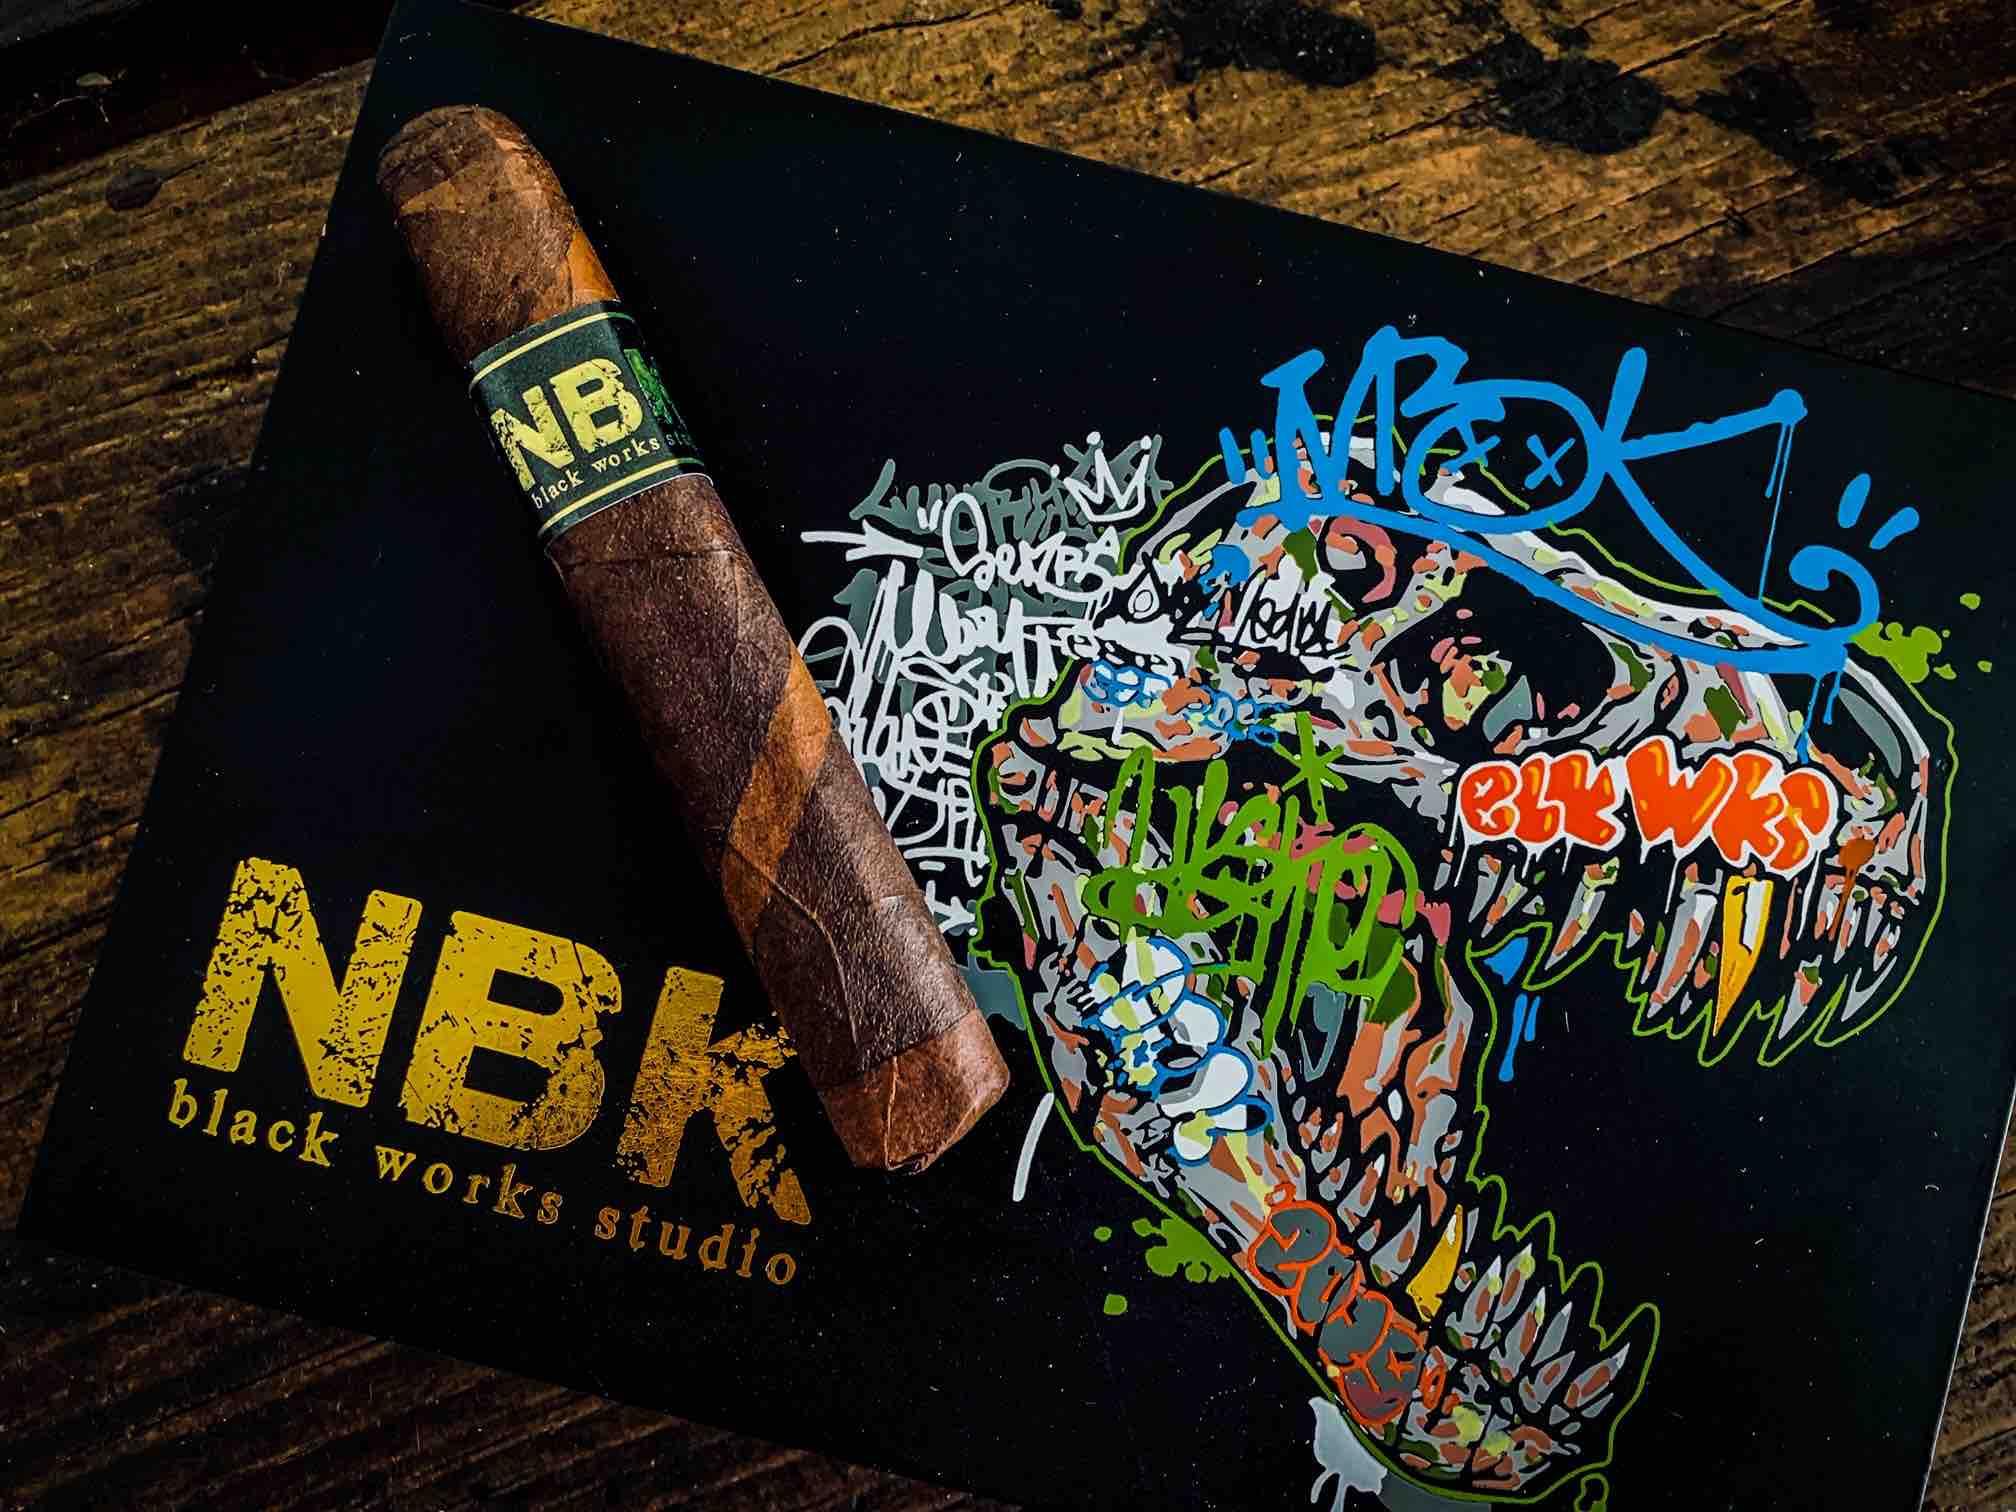 Cigar News: Black Works Studio NBK Lizard King Rolls Out This Month